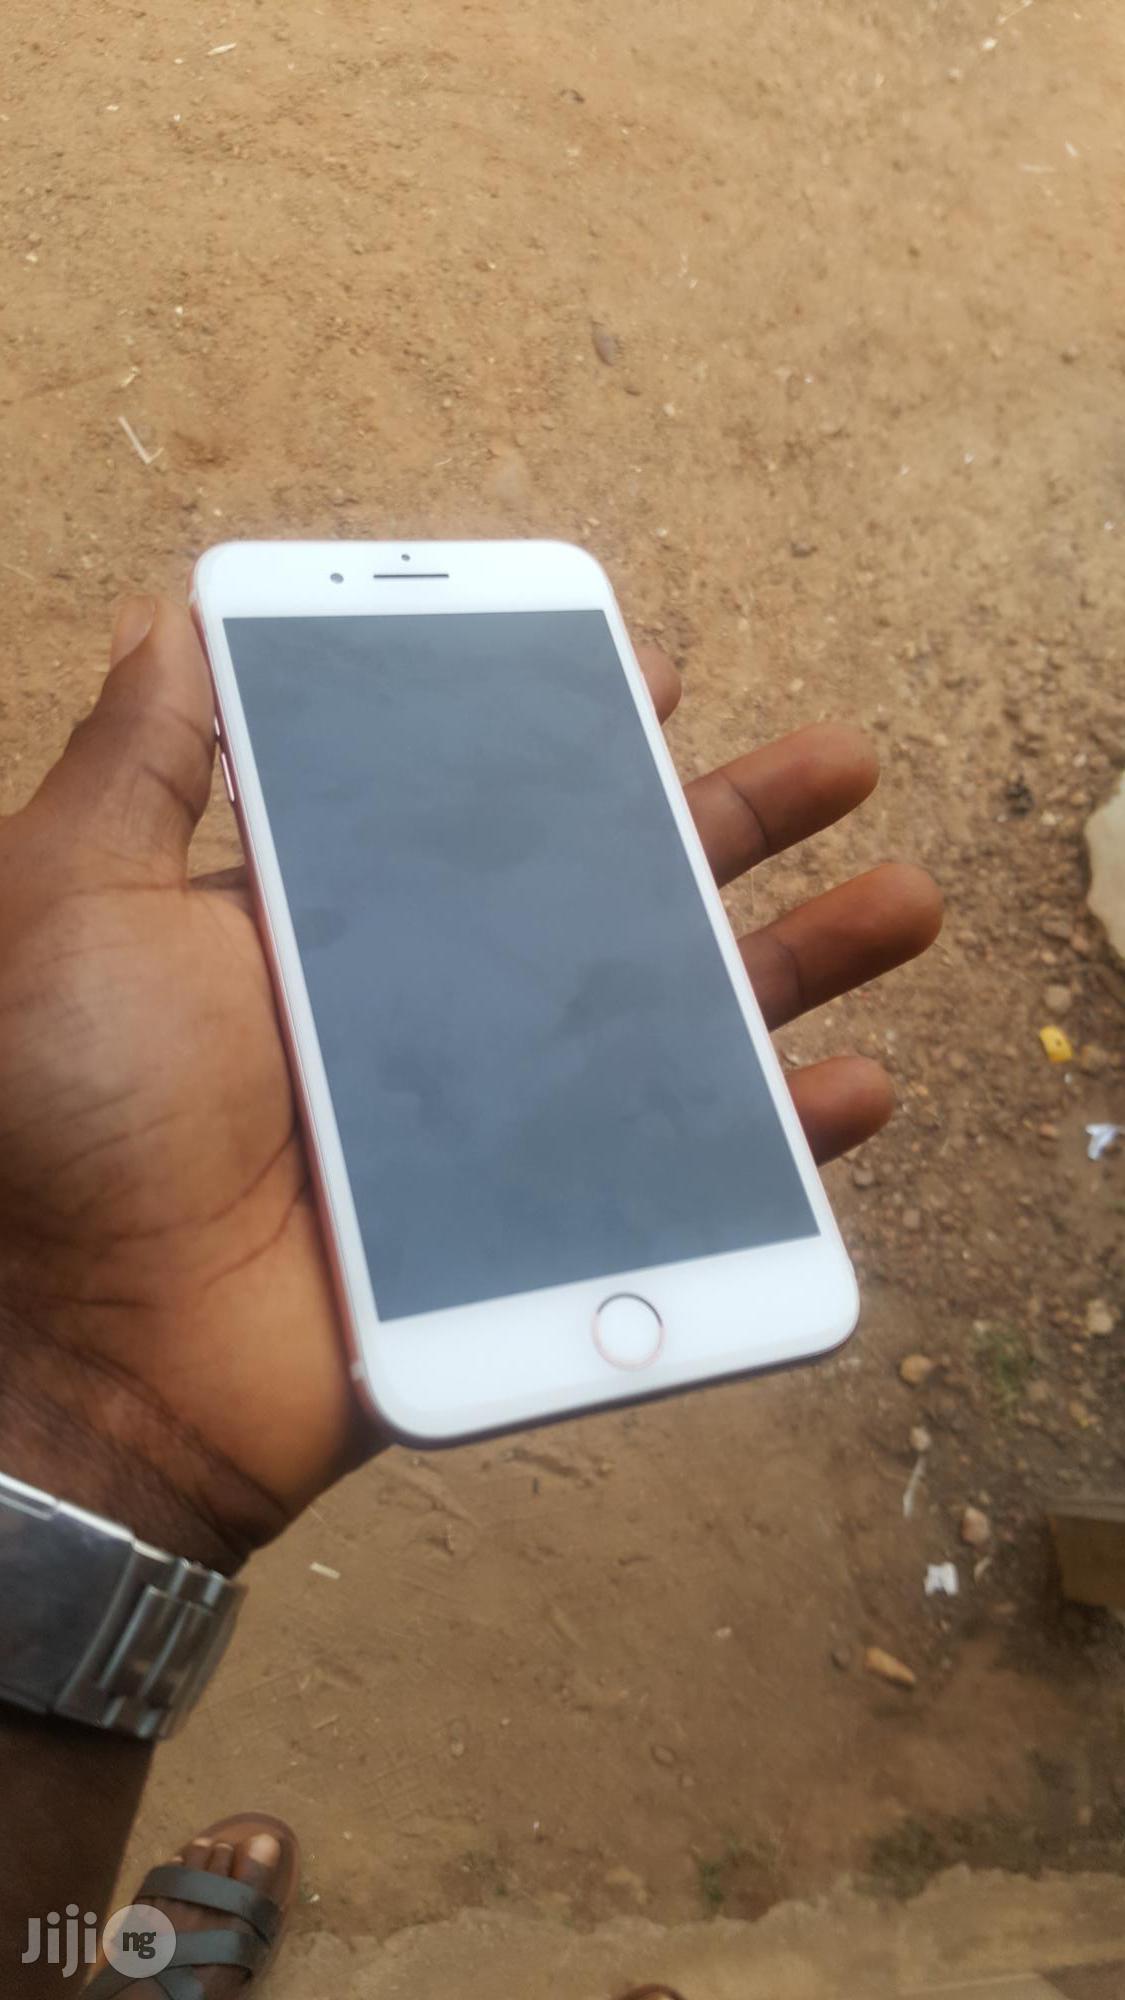 Apple iPhone 7 Plus 128 GB Pink | Mobile Phones for sale in Ibadan, Oyo State, Nigeria